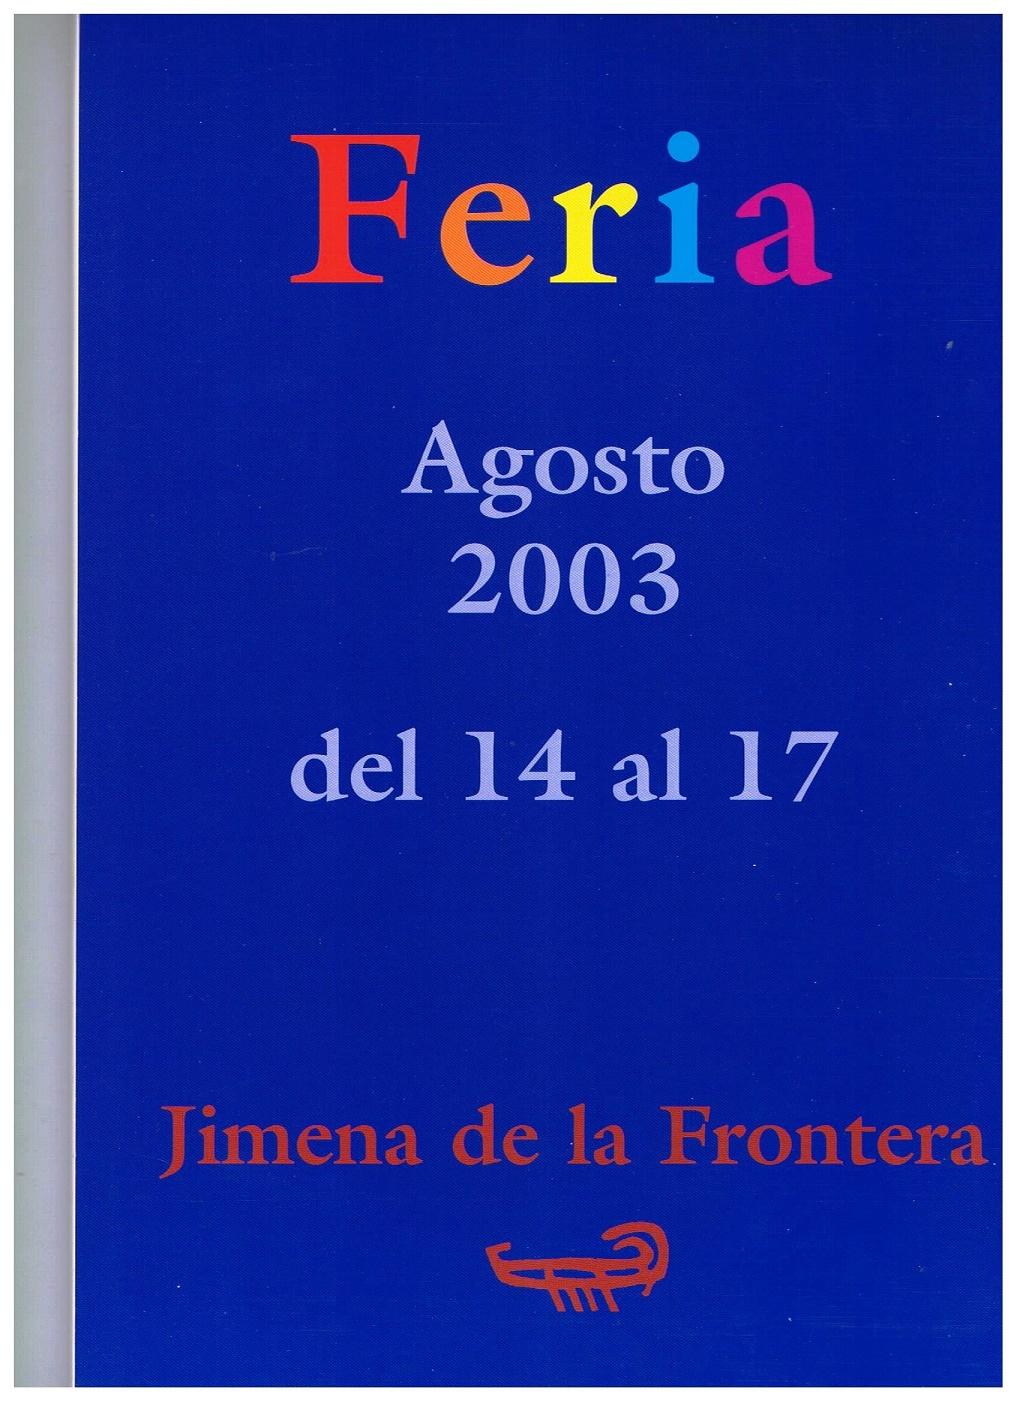 Libreto oficial de la feria 2003.